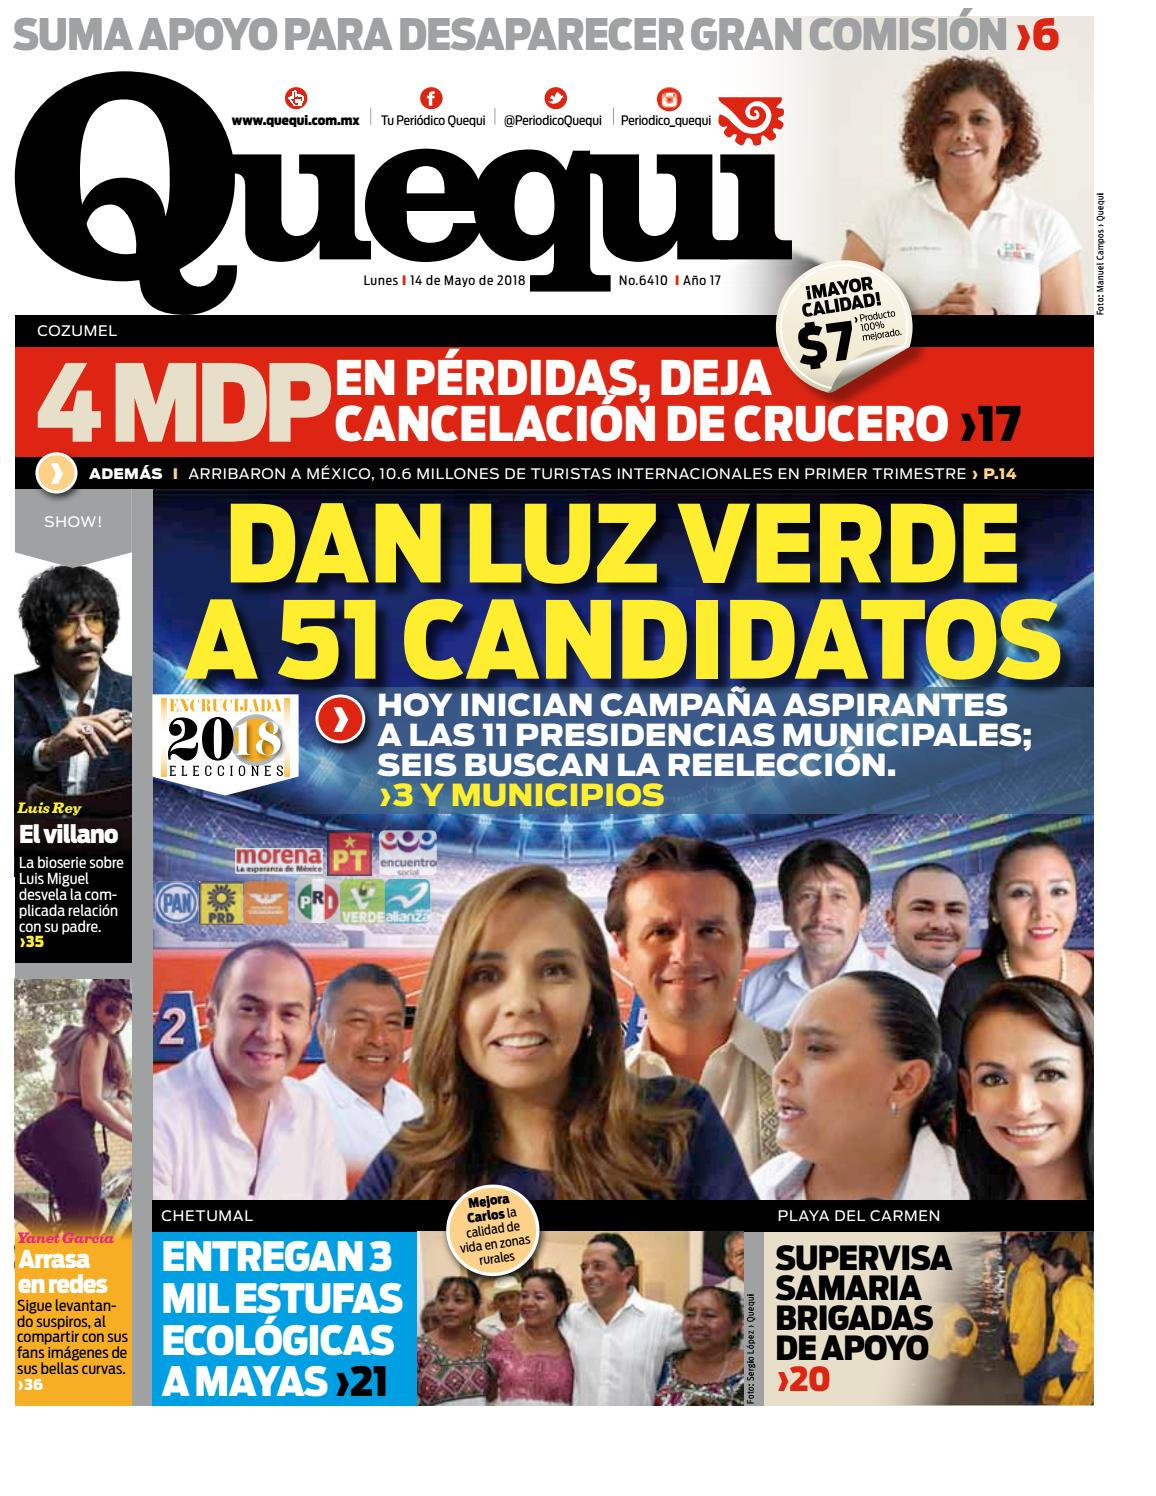 TU PERIODICO QUEQUI by Quequi - issuu 1dfd147a438